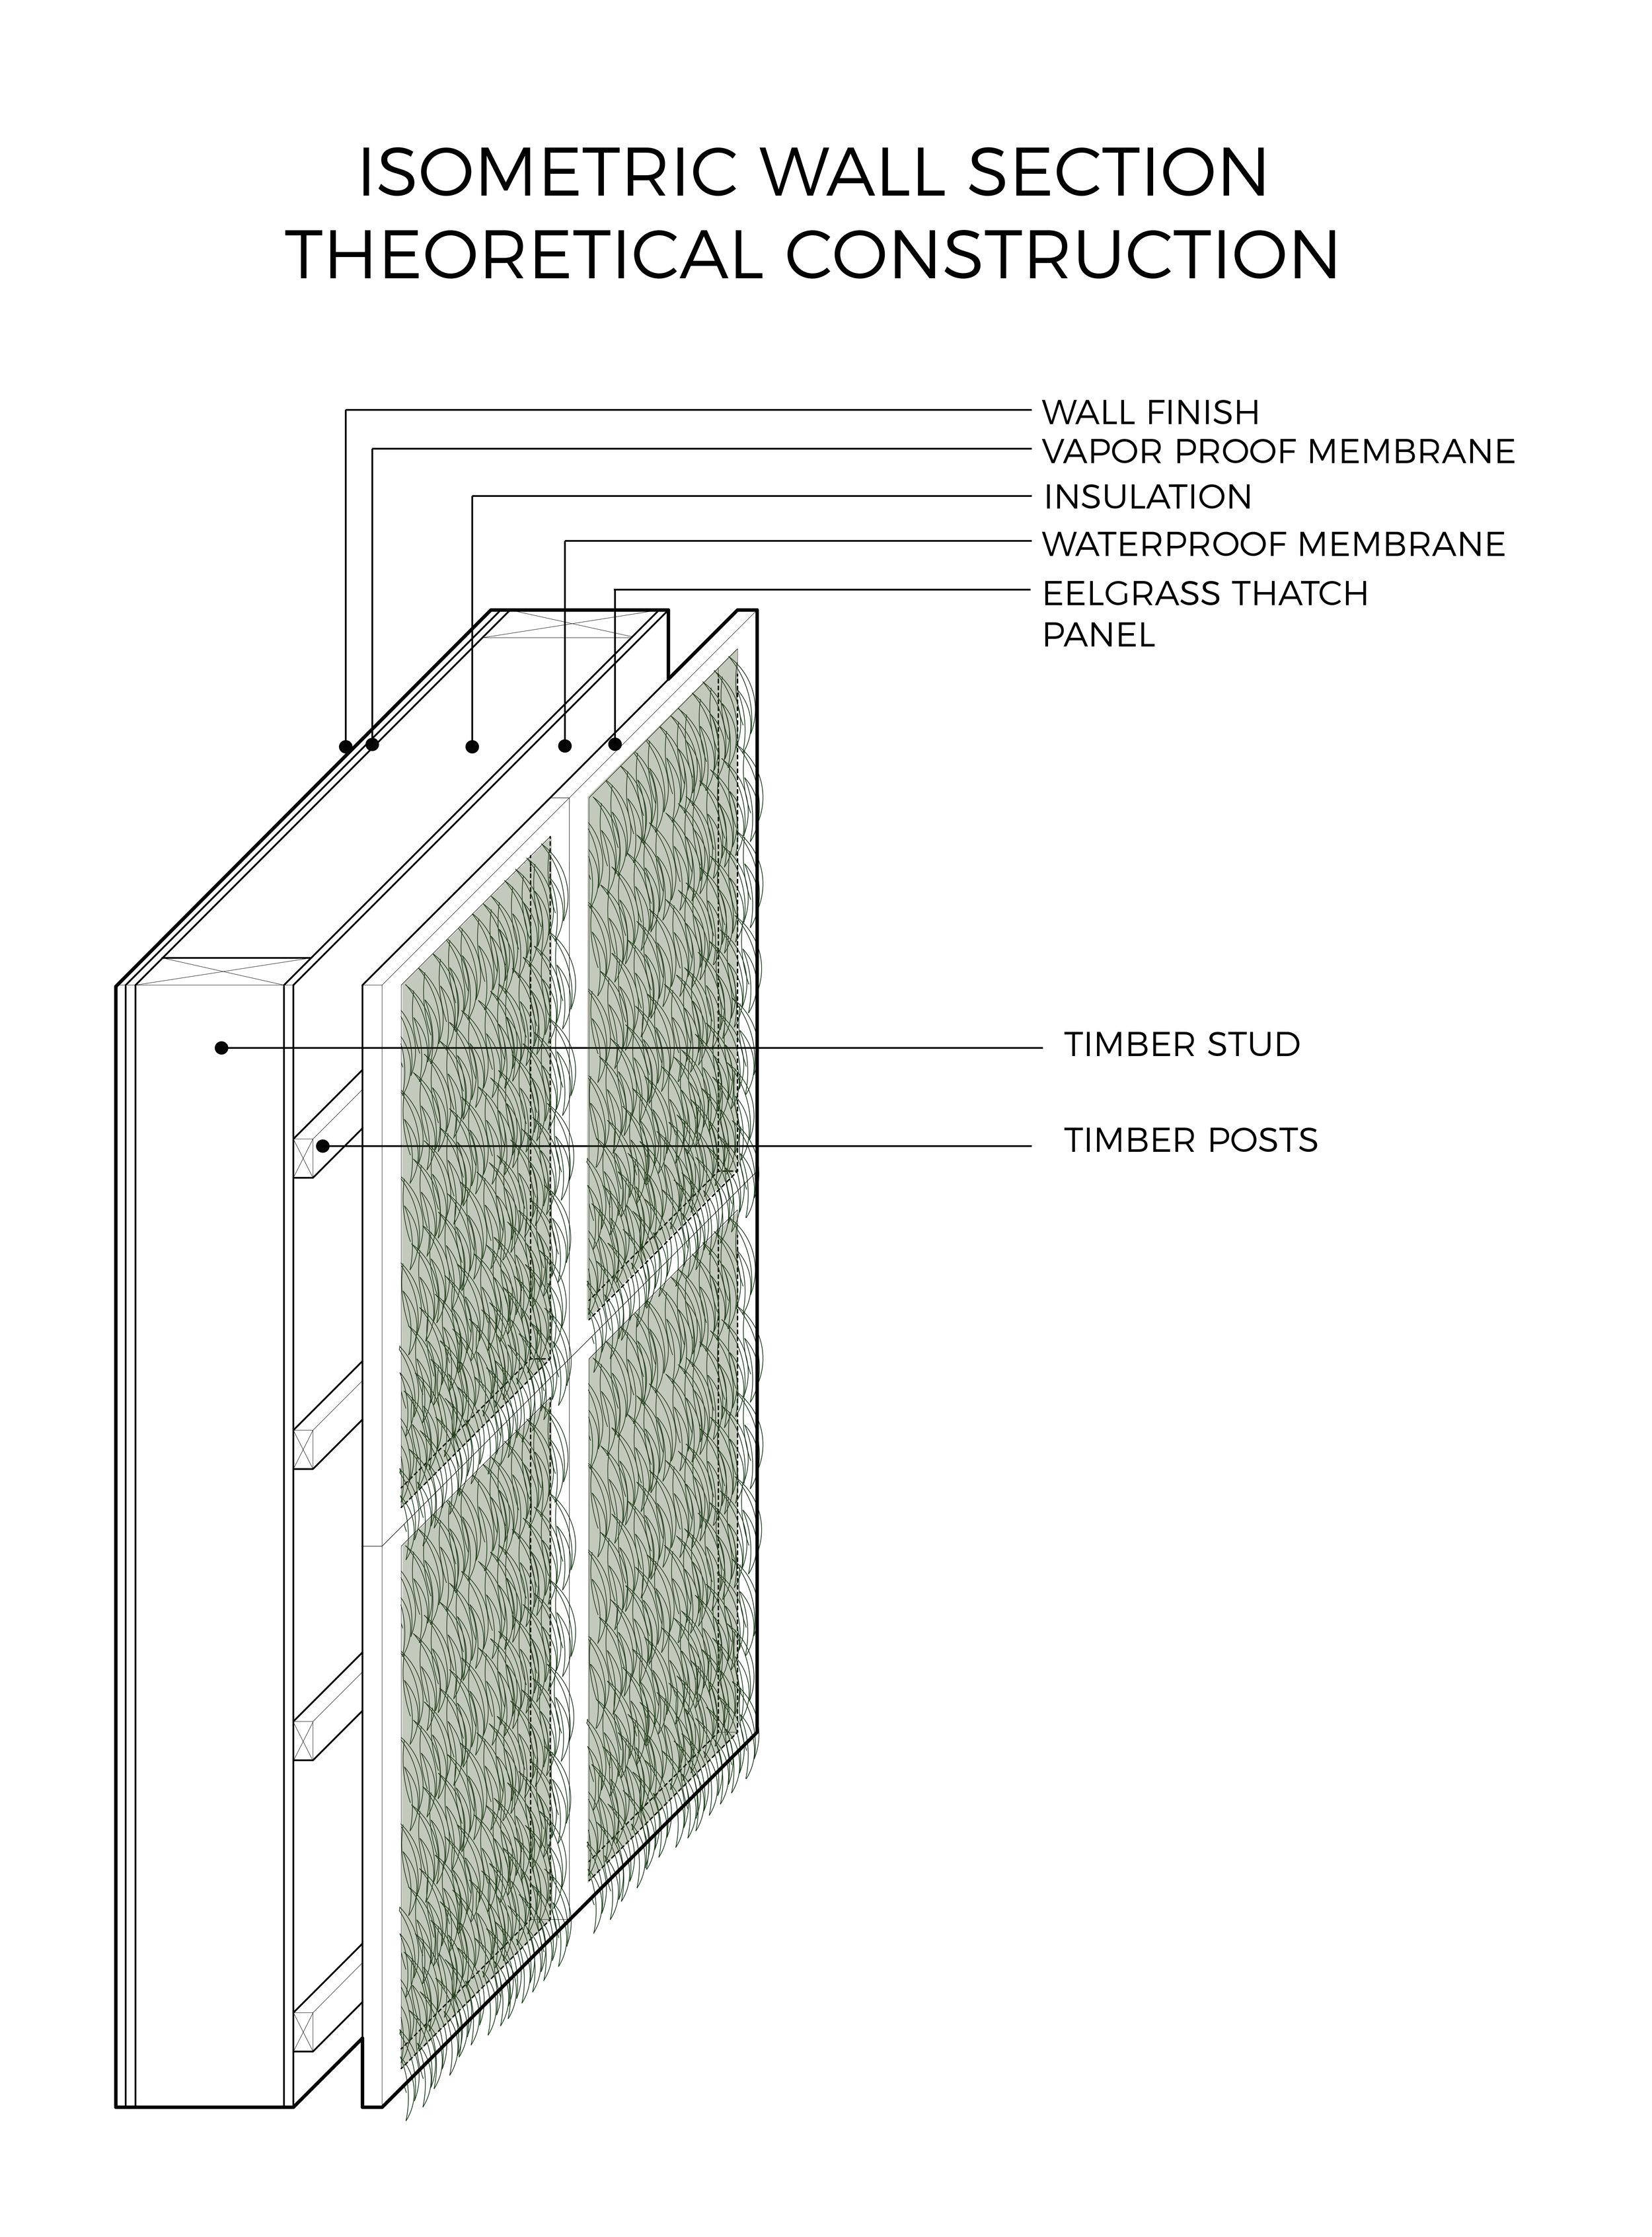 theoreticalwallconstruction-1.jpg